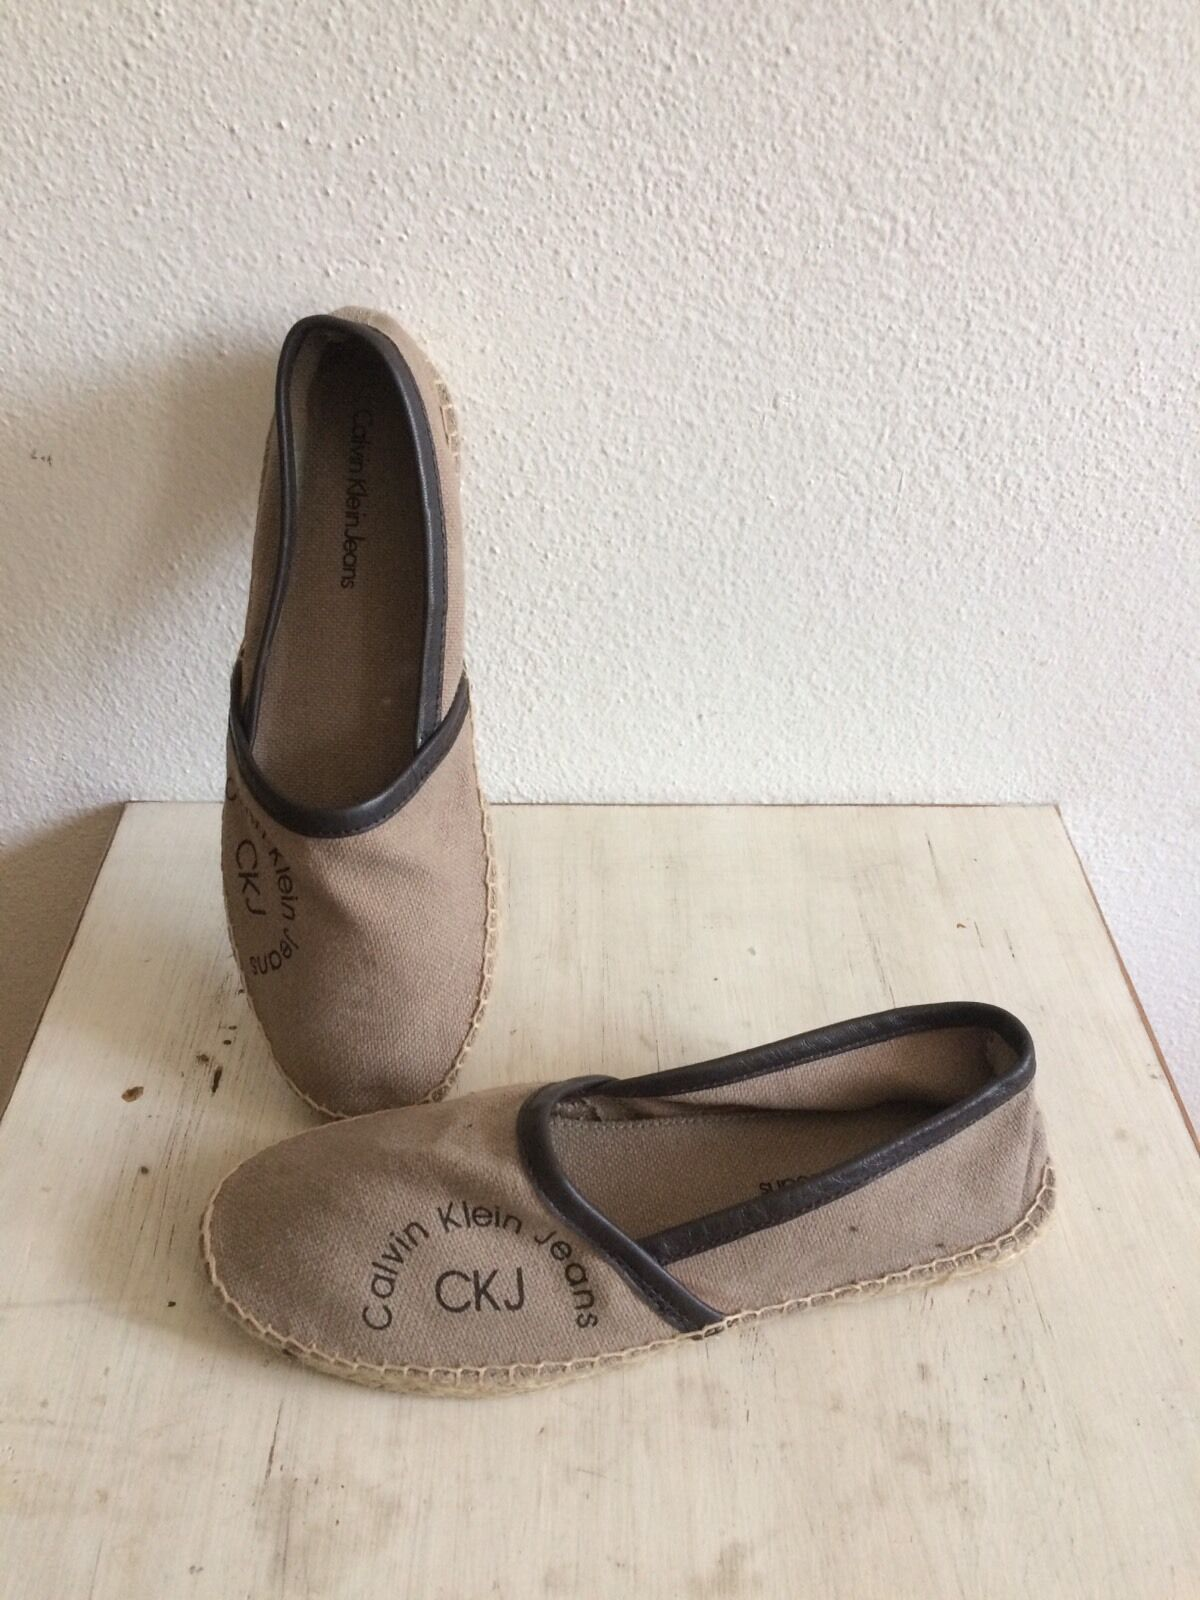 Calvin Klein Espandrilles Slipper Schuhe zu Jeans Hose Kleid Rock Gr. 38 Conleys